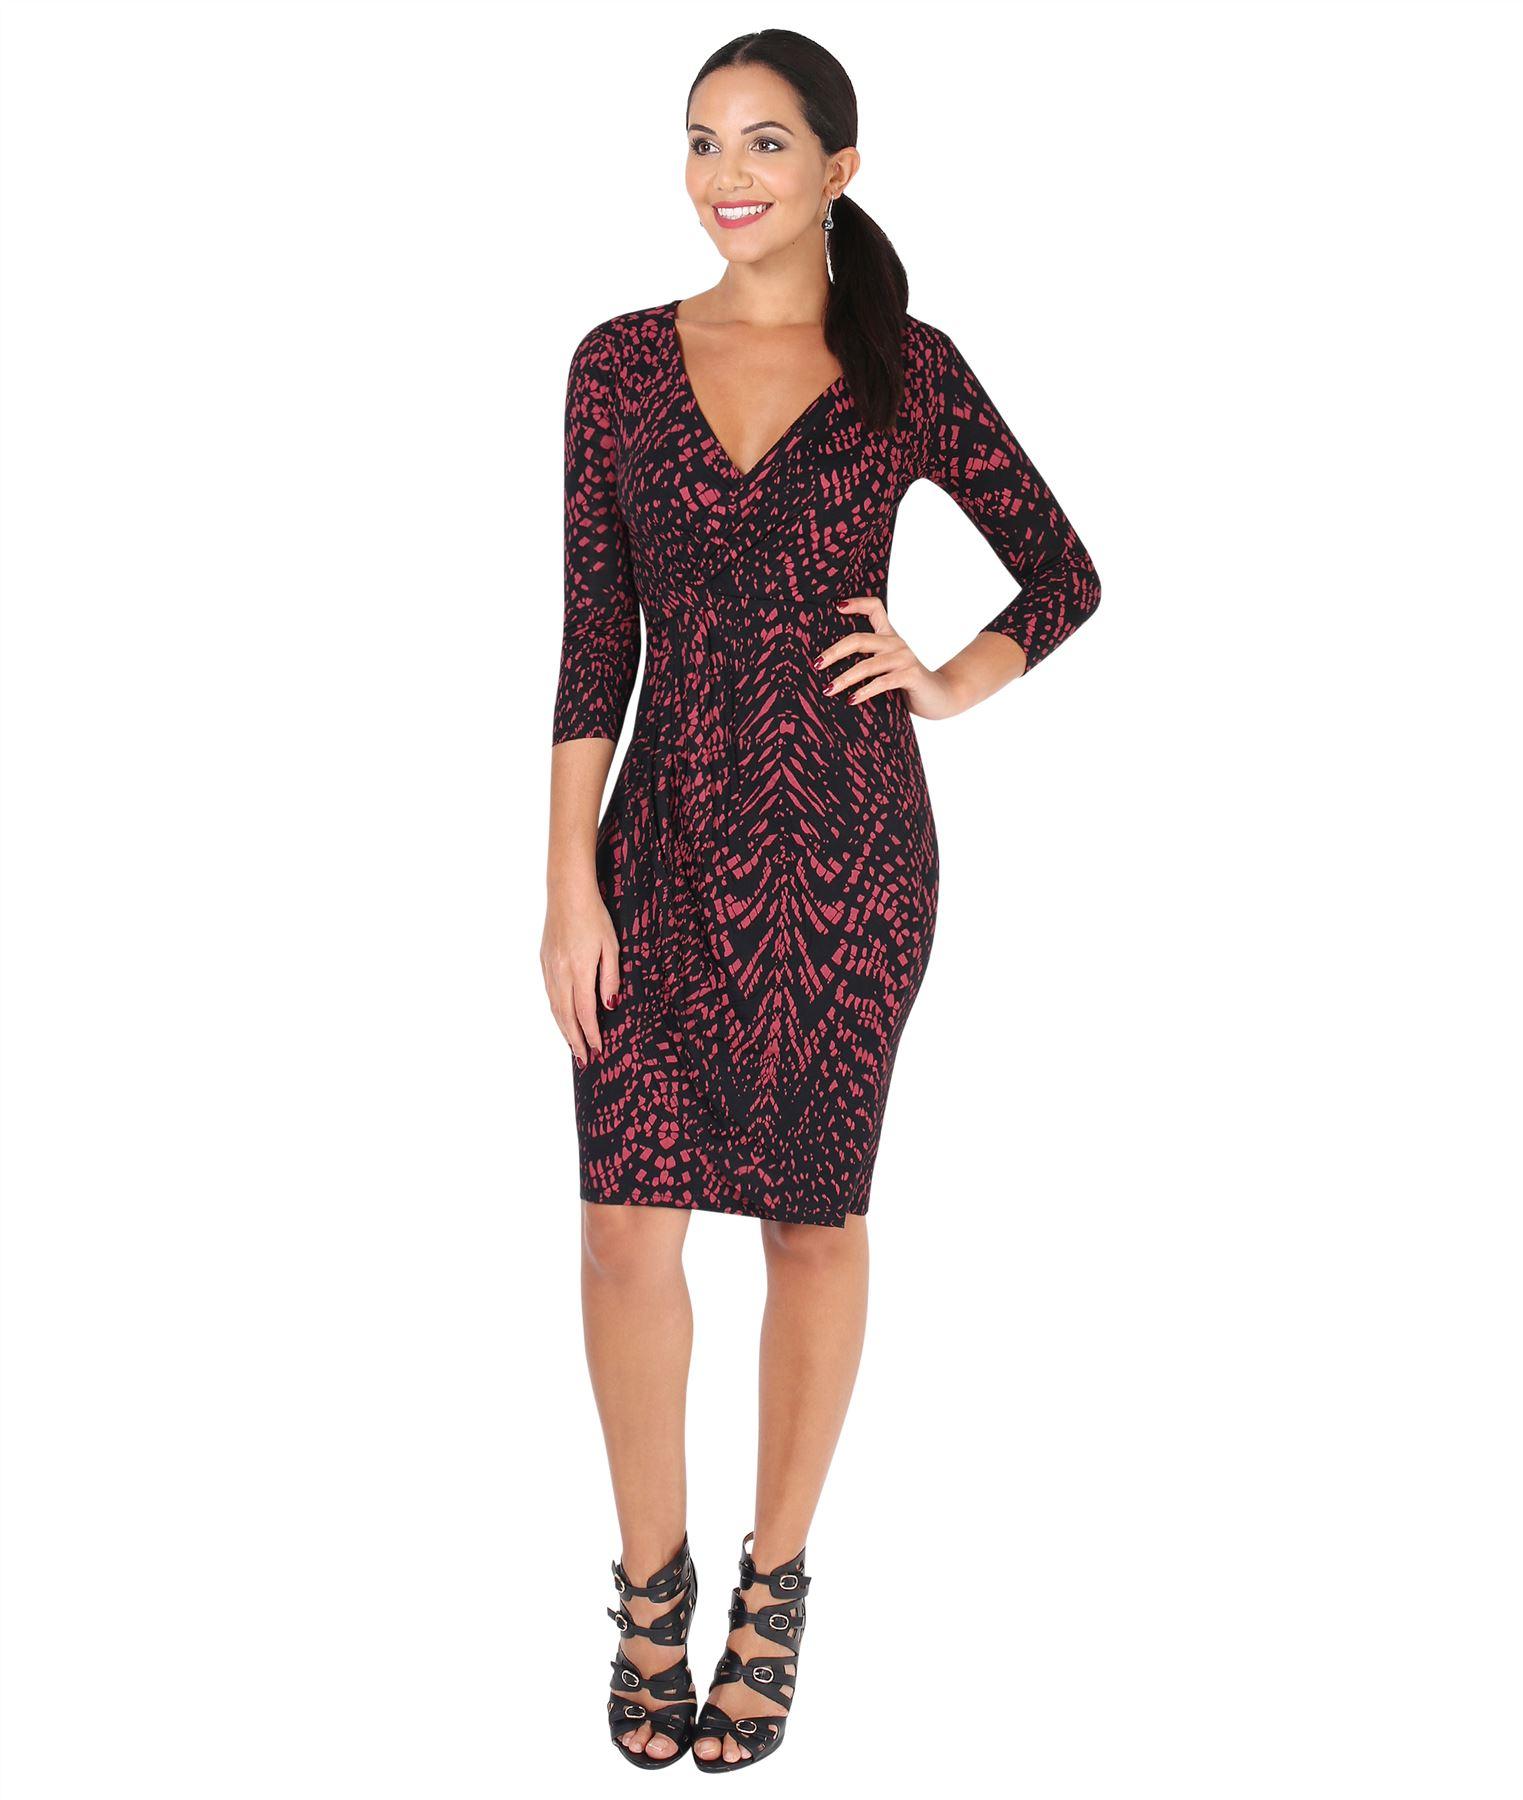 Womens-V-Neck-Dress-Top-Bodycon-Skirt-Midi-Snakeskin-Print-Cross-Over-Party-Wrap thumbnail 24